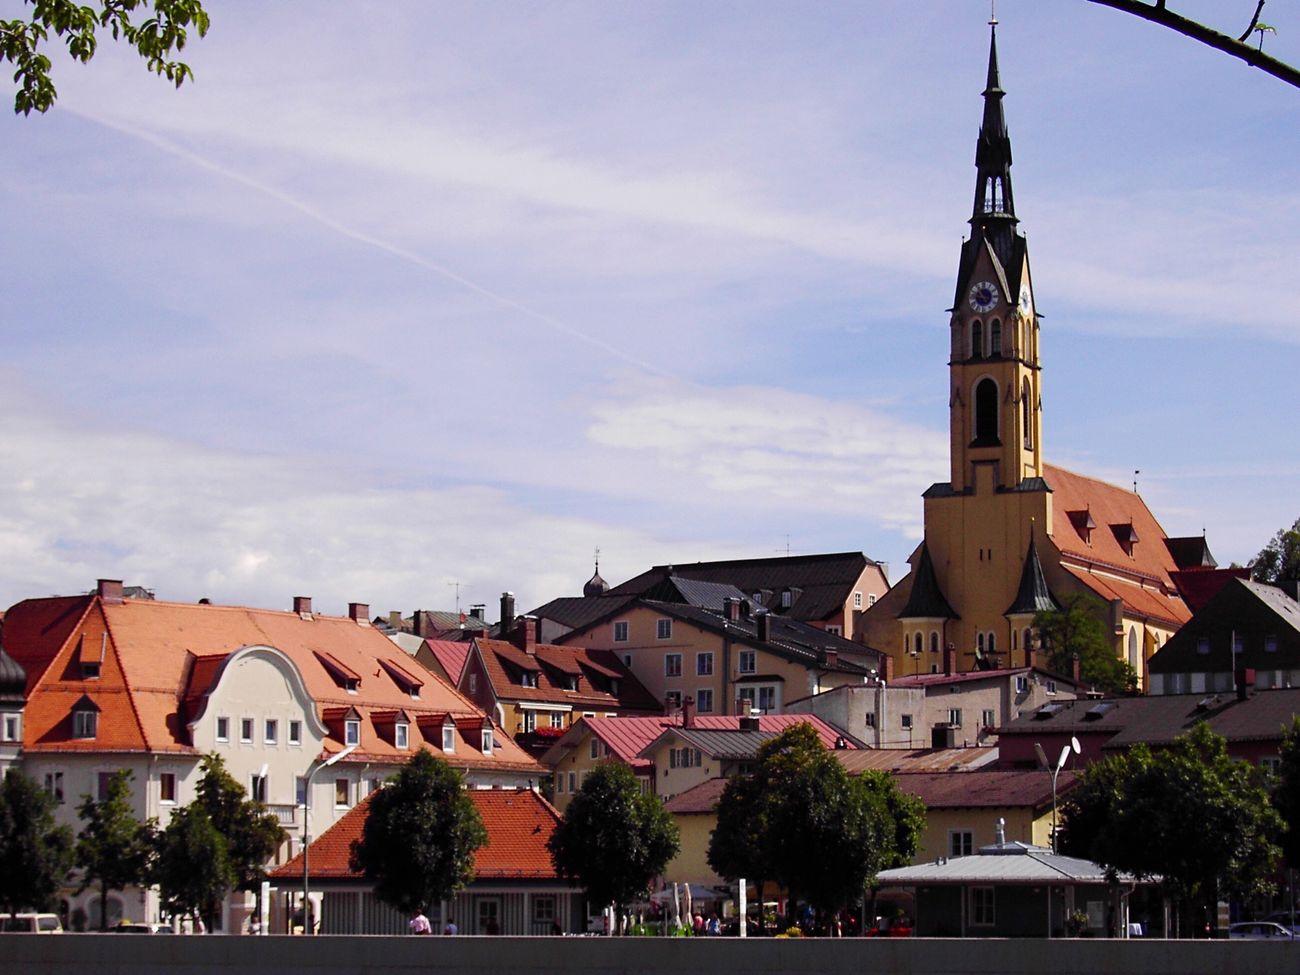 Germany Bavaria Town Church Catholic Bad Tölz